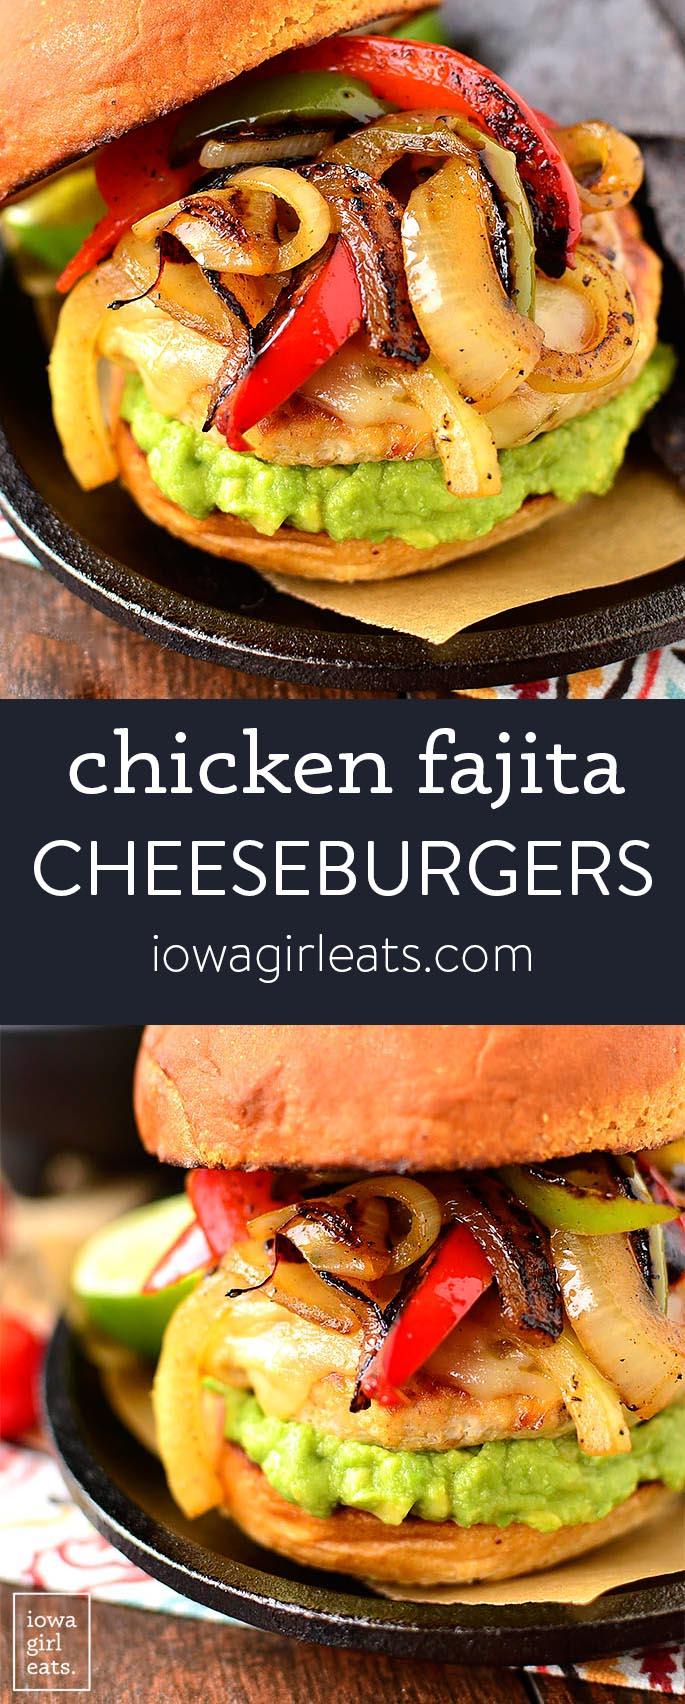 Photo collage of chicken fajita cheeseburgers